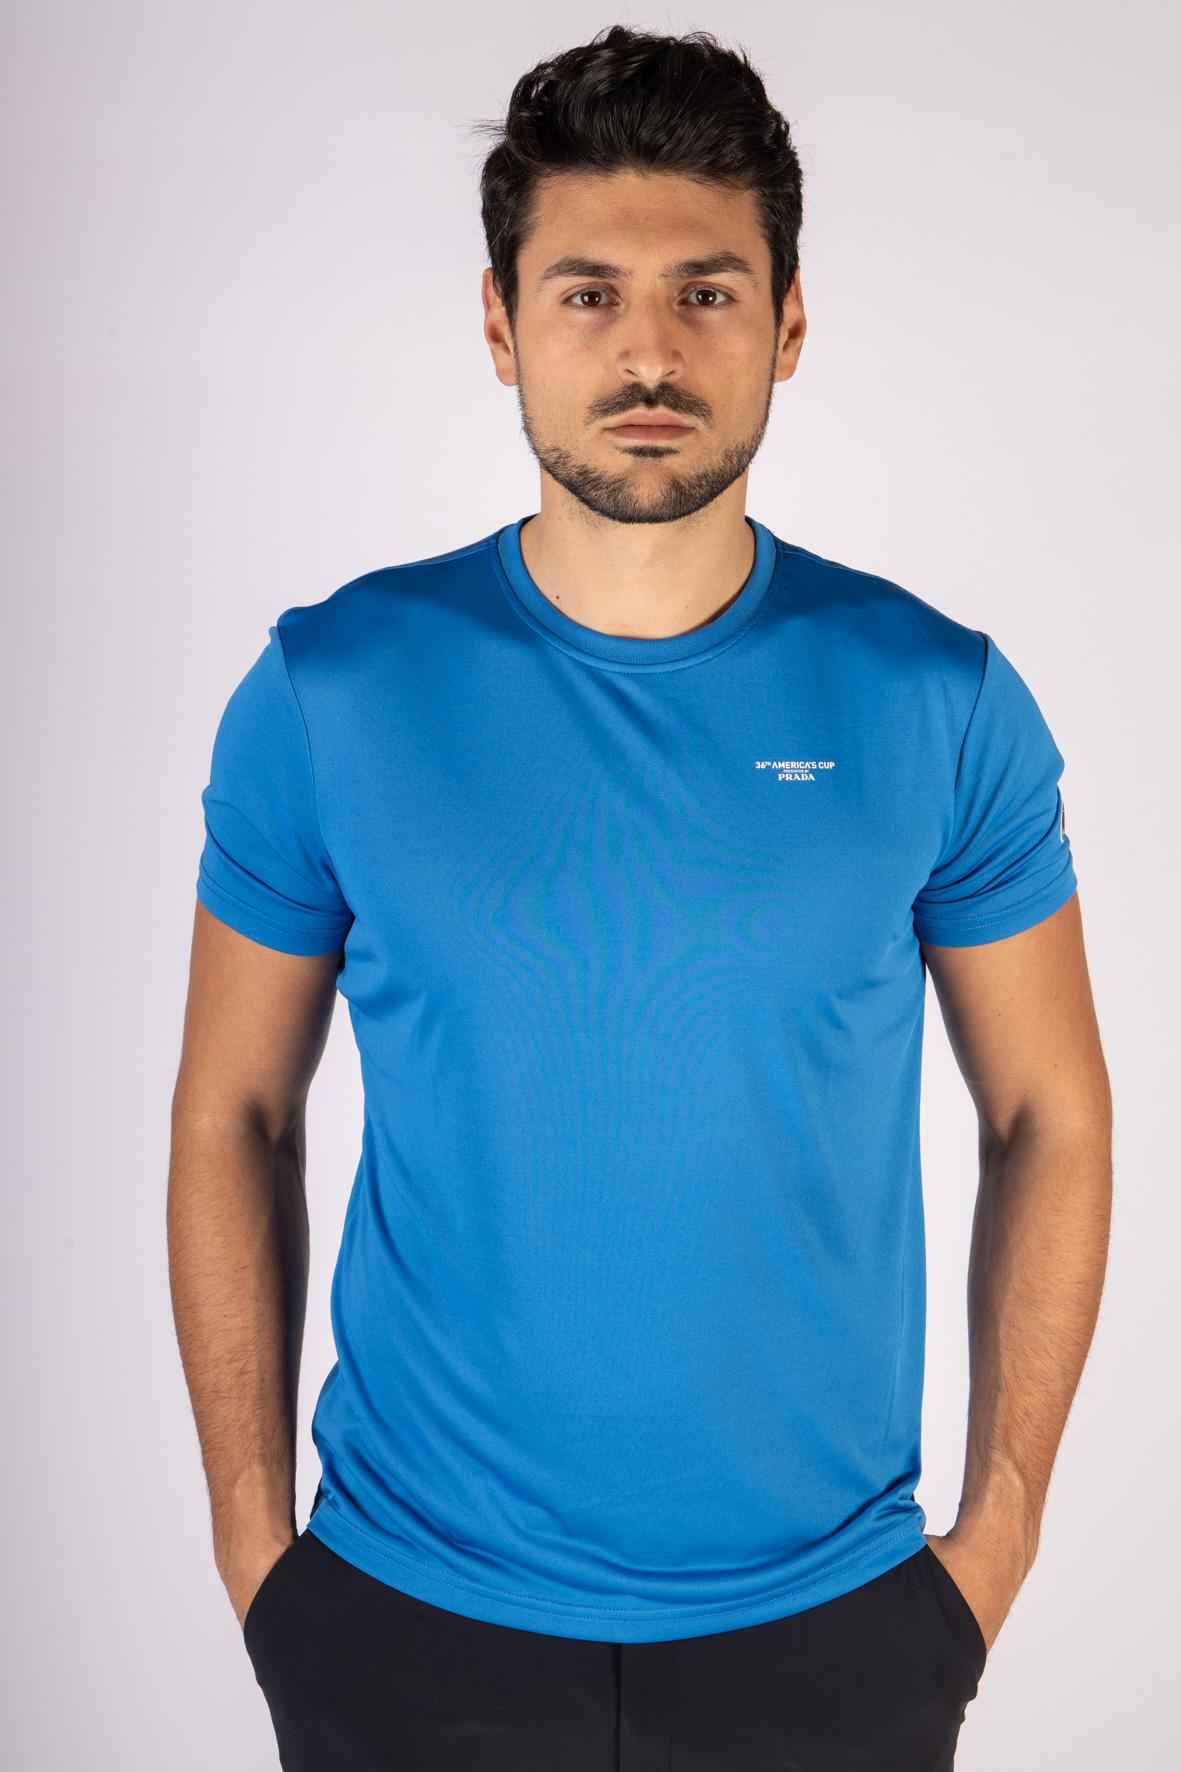 T-SHIRT AMERICA'S CUP NORTH SAILS | T-shirt | 4523070760